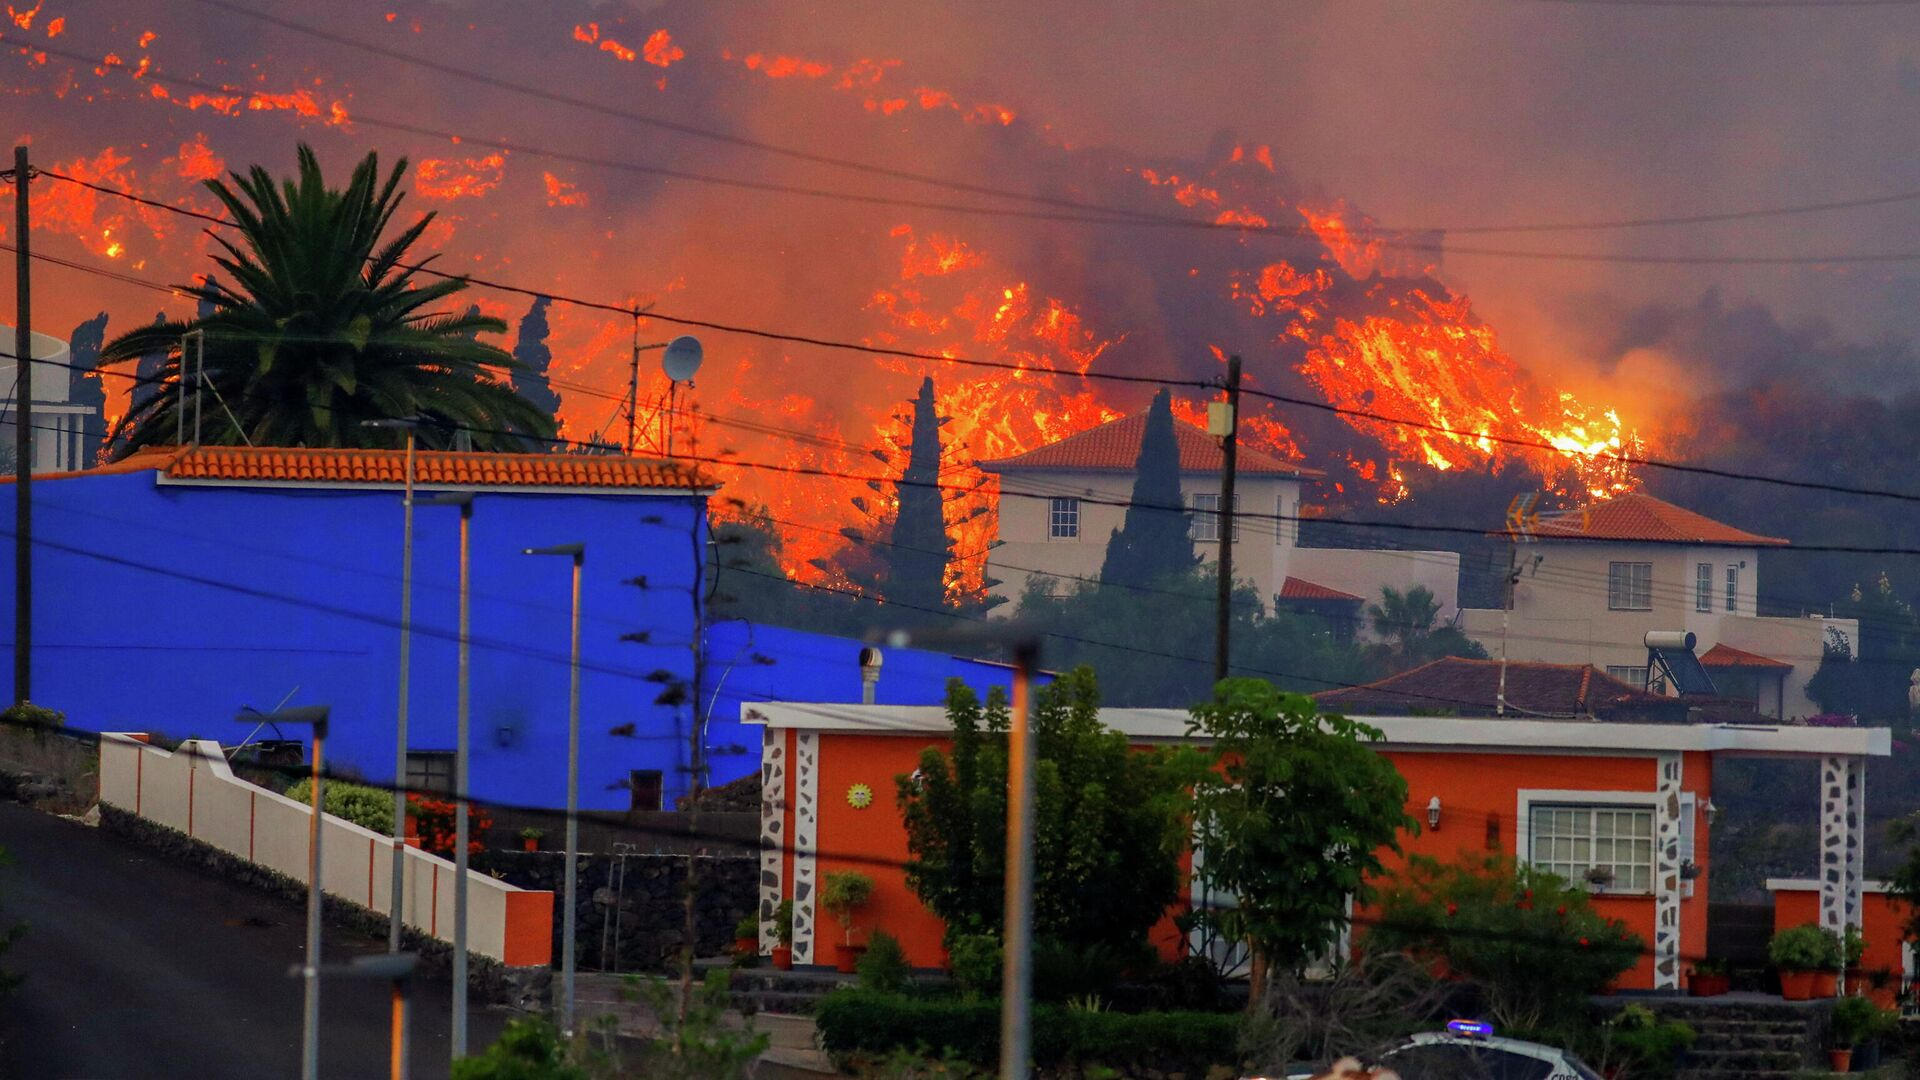 Vulkanausbruch auf La Palma, Spanien - SNA, 1920, 28.09.2021